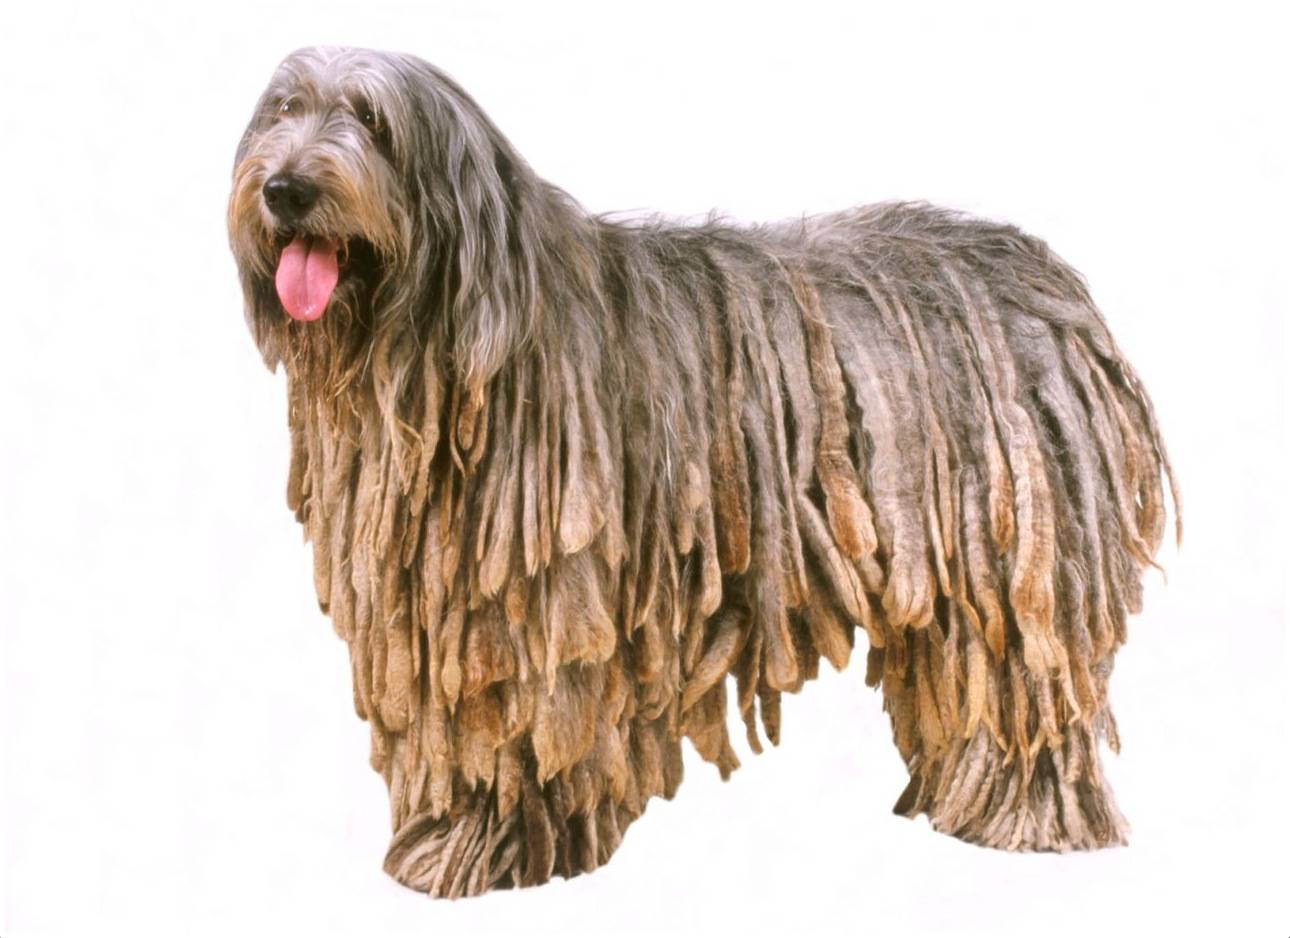 Порода бергамаско: описание, характеристика, характер и фото | все о собаках